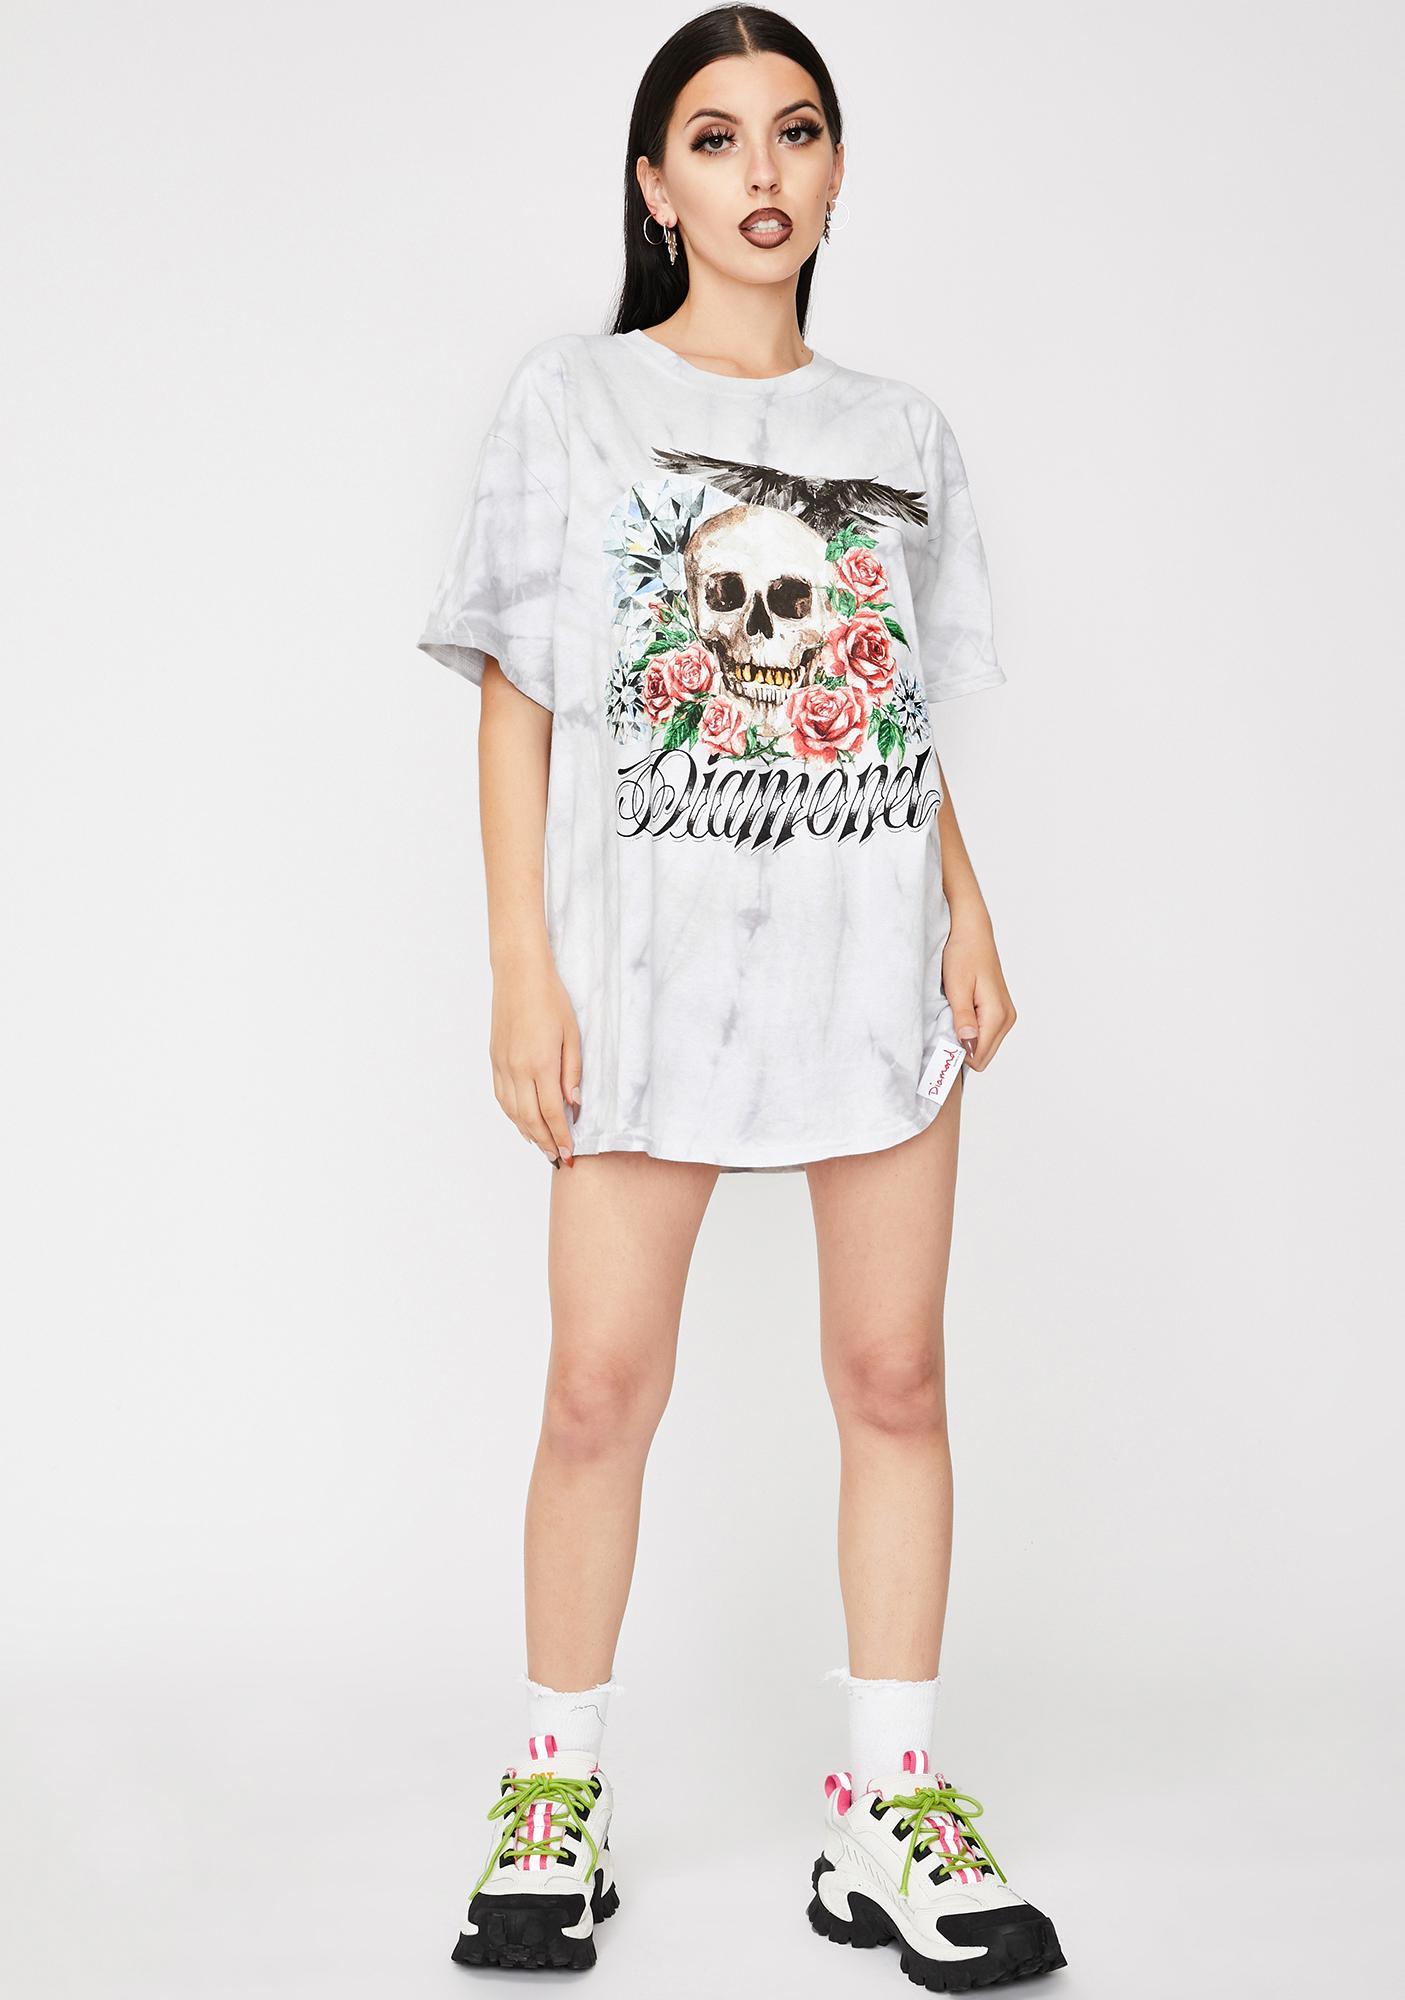 Diamond Supply Co Skull And Crow Tie Dye Graphic Tee